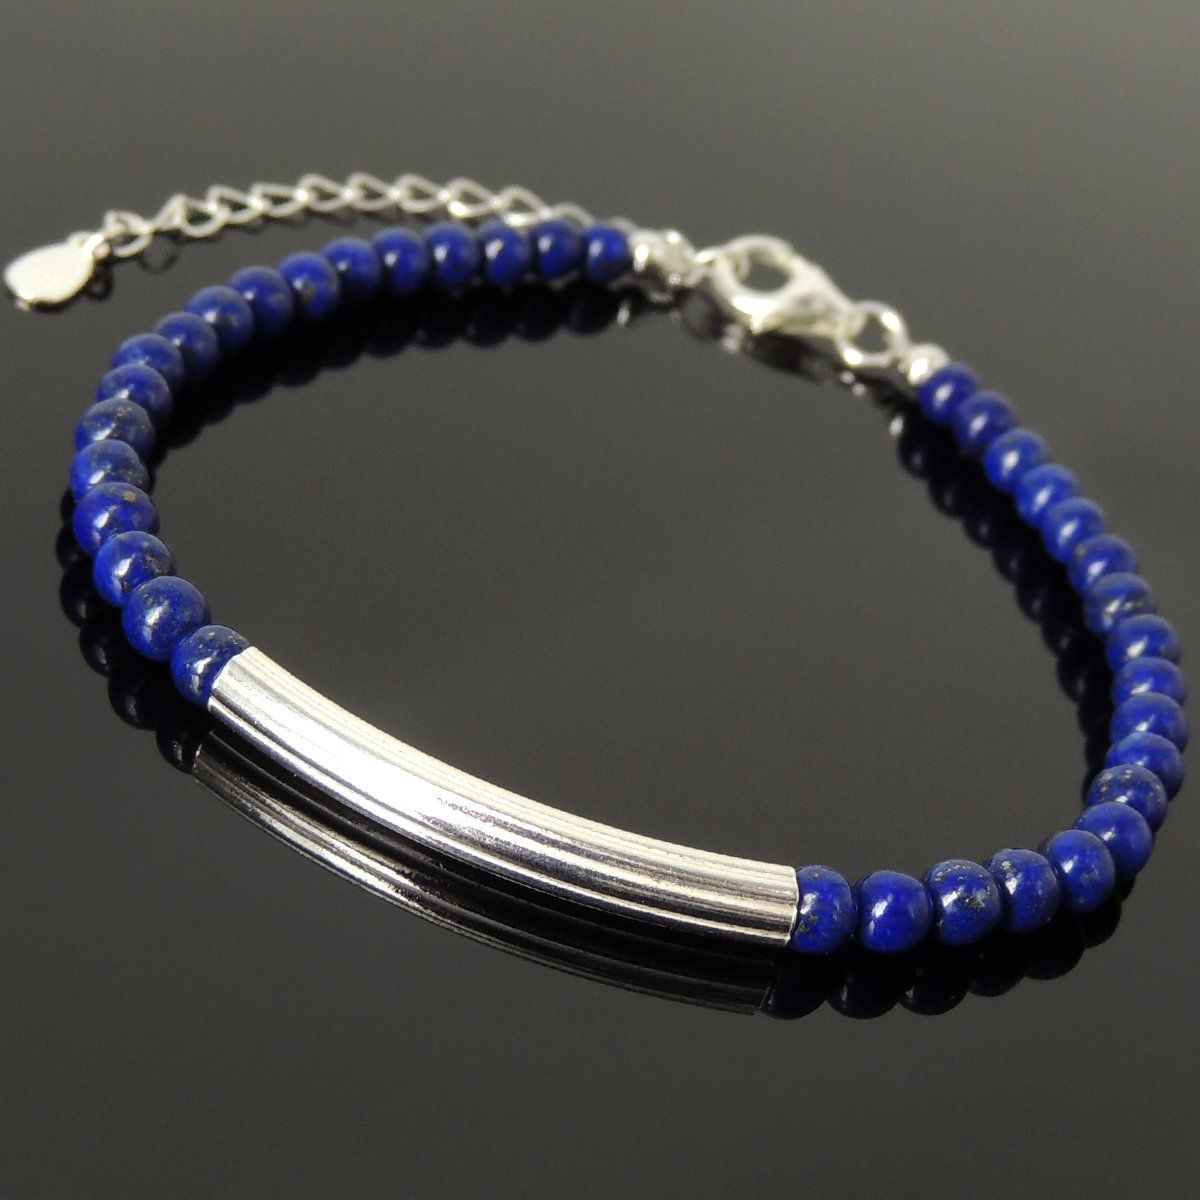 4mm Lapis Lazuli Healing Gemstone Bracelet with S925 Sterling Silver Elegant Charm, Chain & Clasp - Handmade by Gem & Silver BR1256